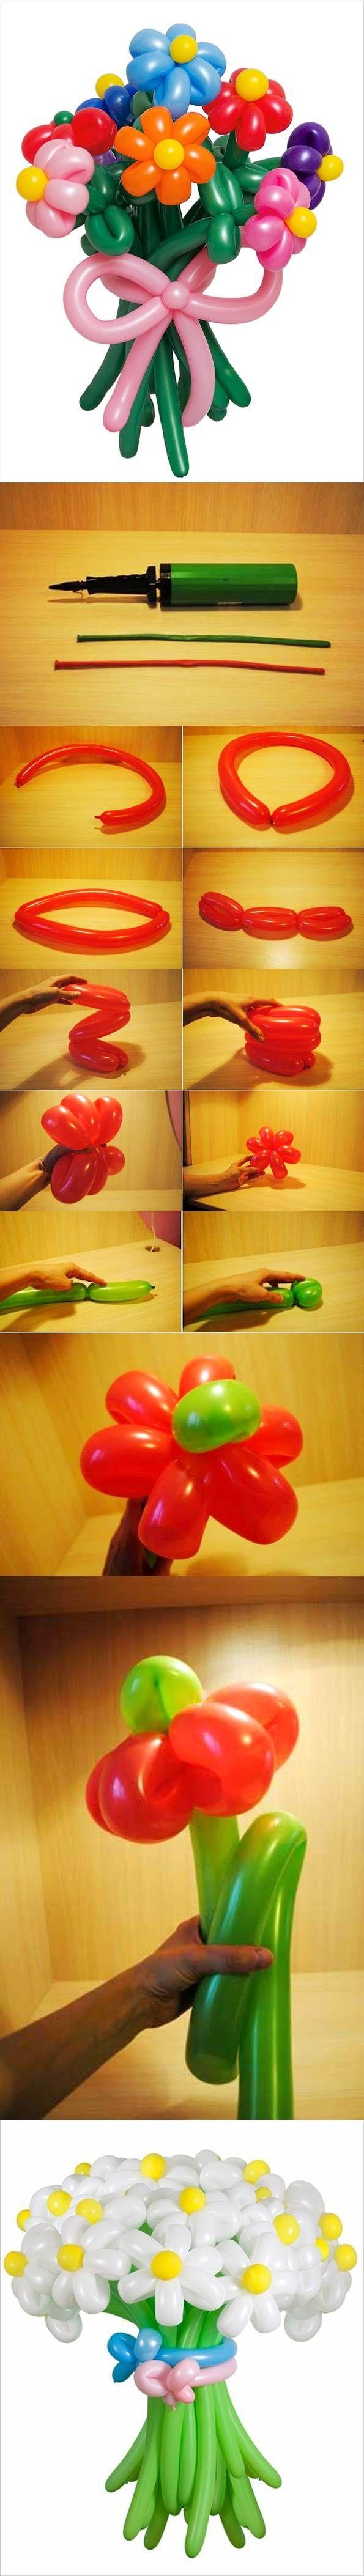 DIY Balloon Flowers | iCreativeIdeas.com Like Us on Facebook ==> https://www.facebook.com/icreativeideas